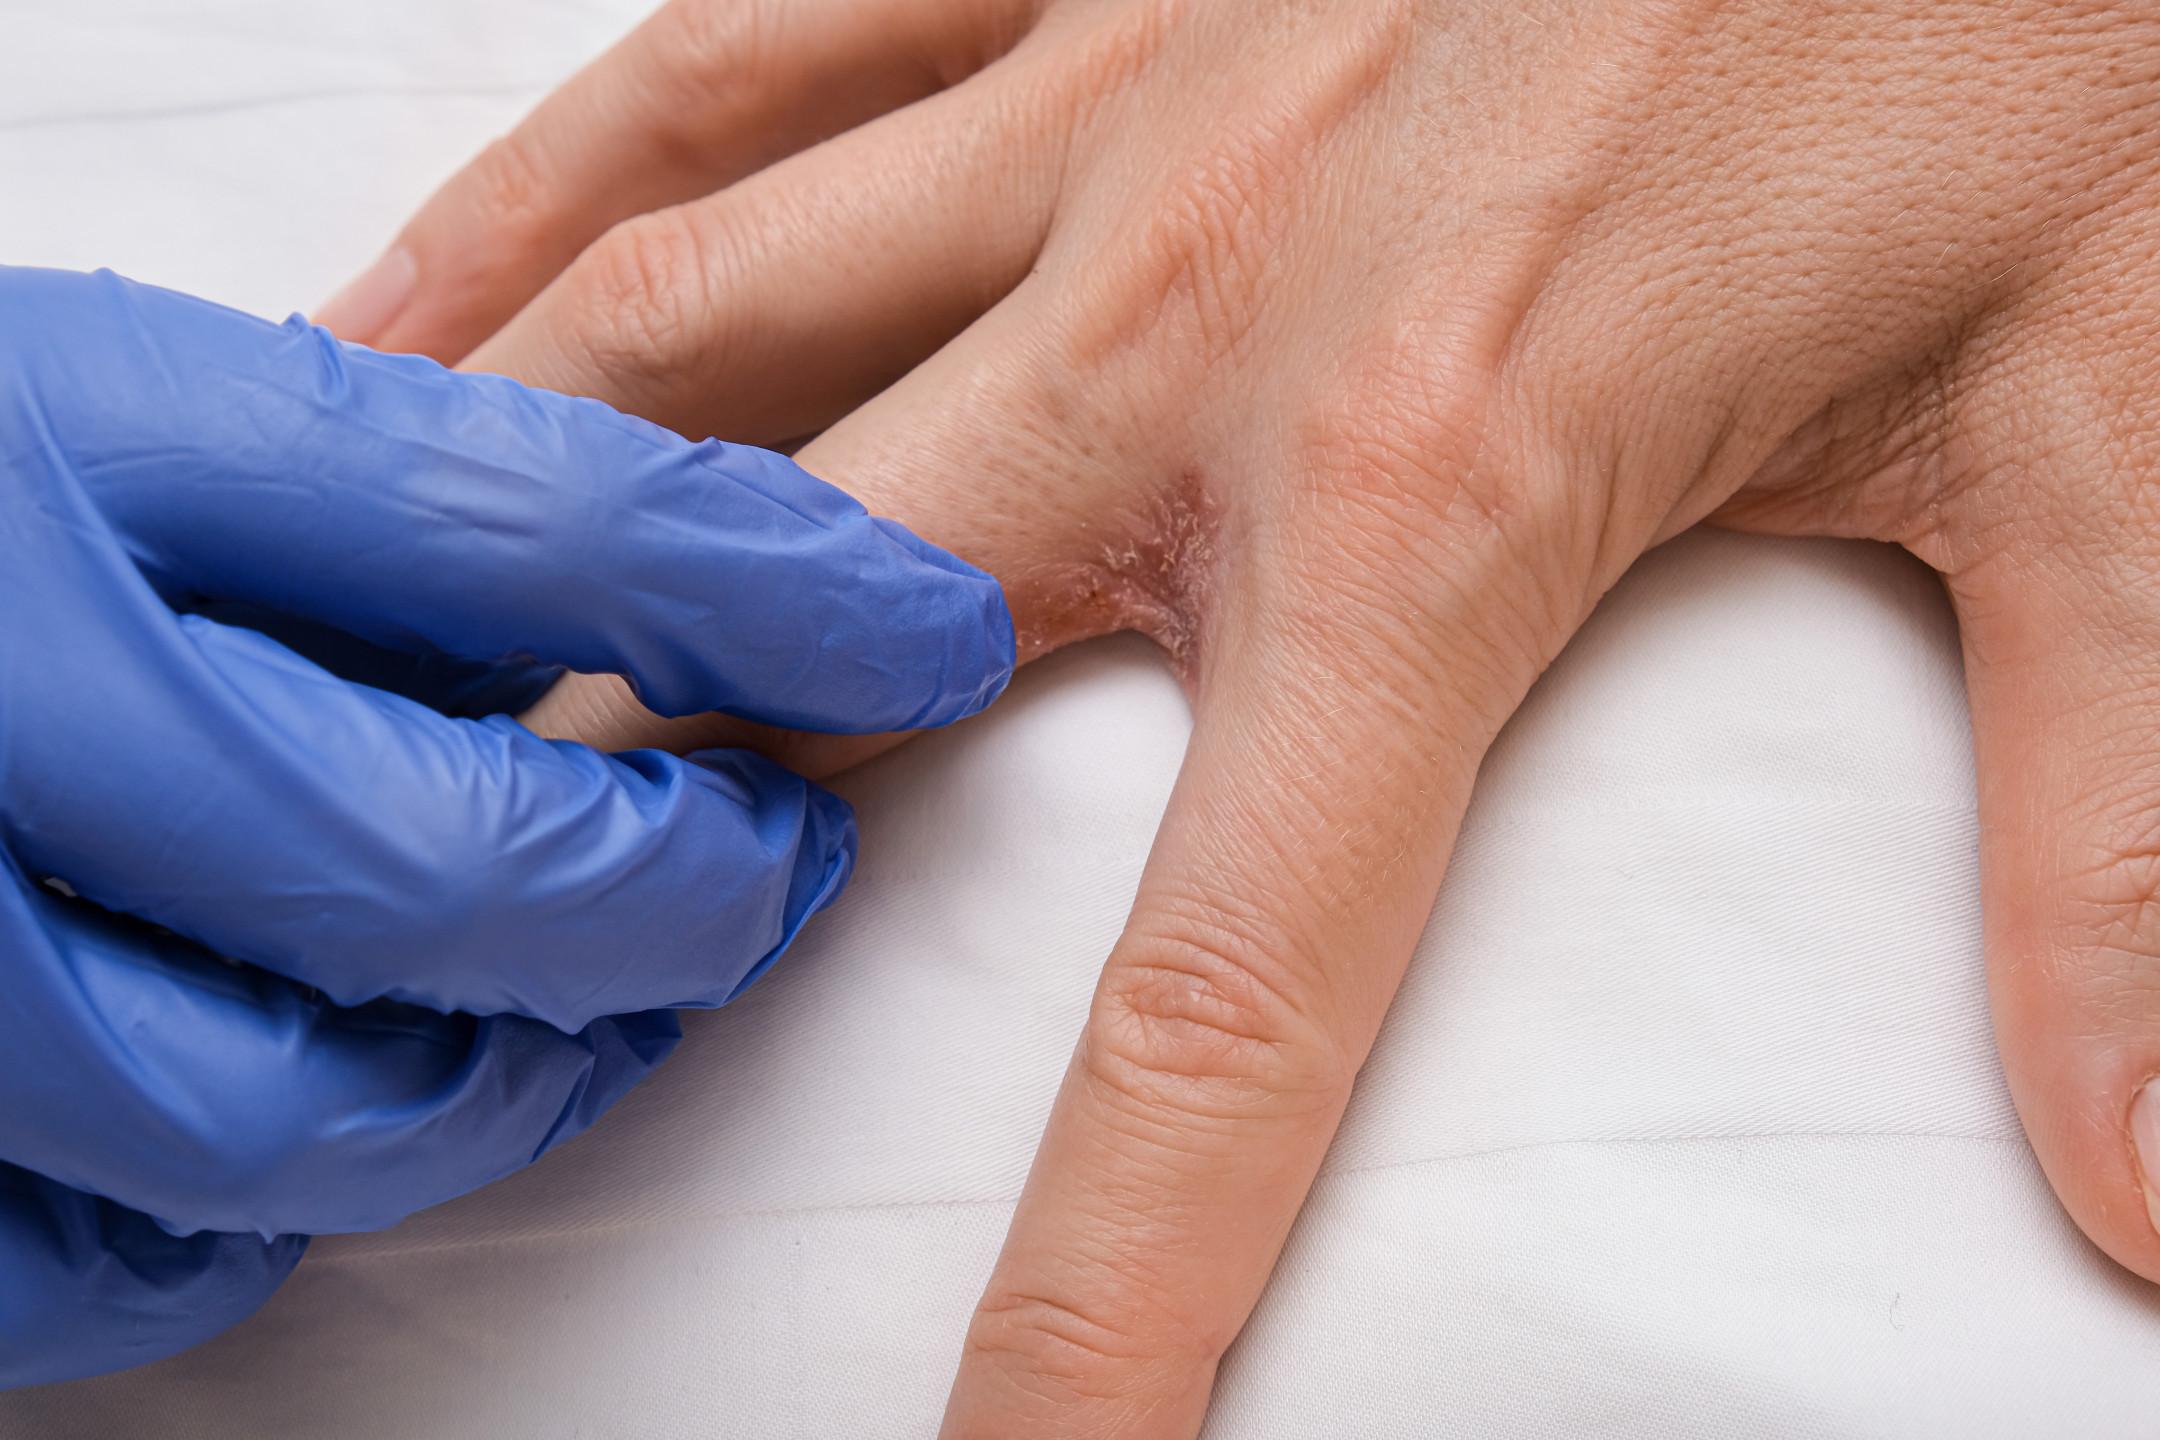 autoinflammatory diseases